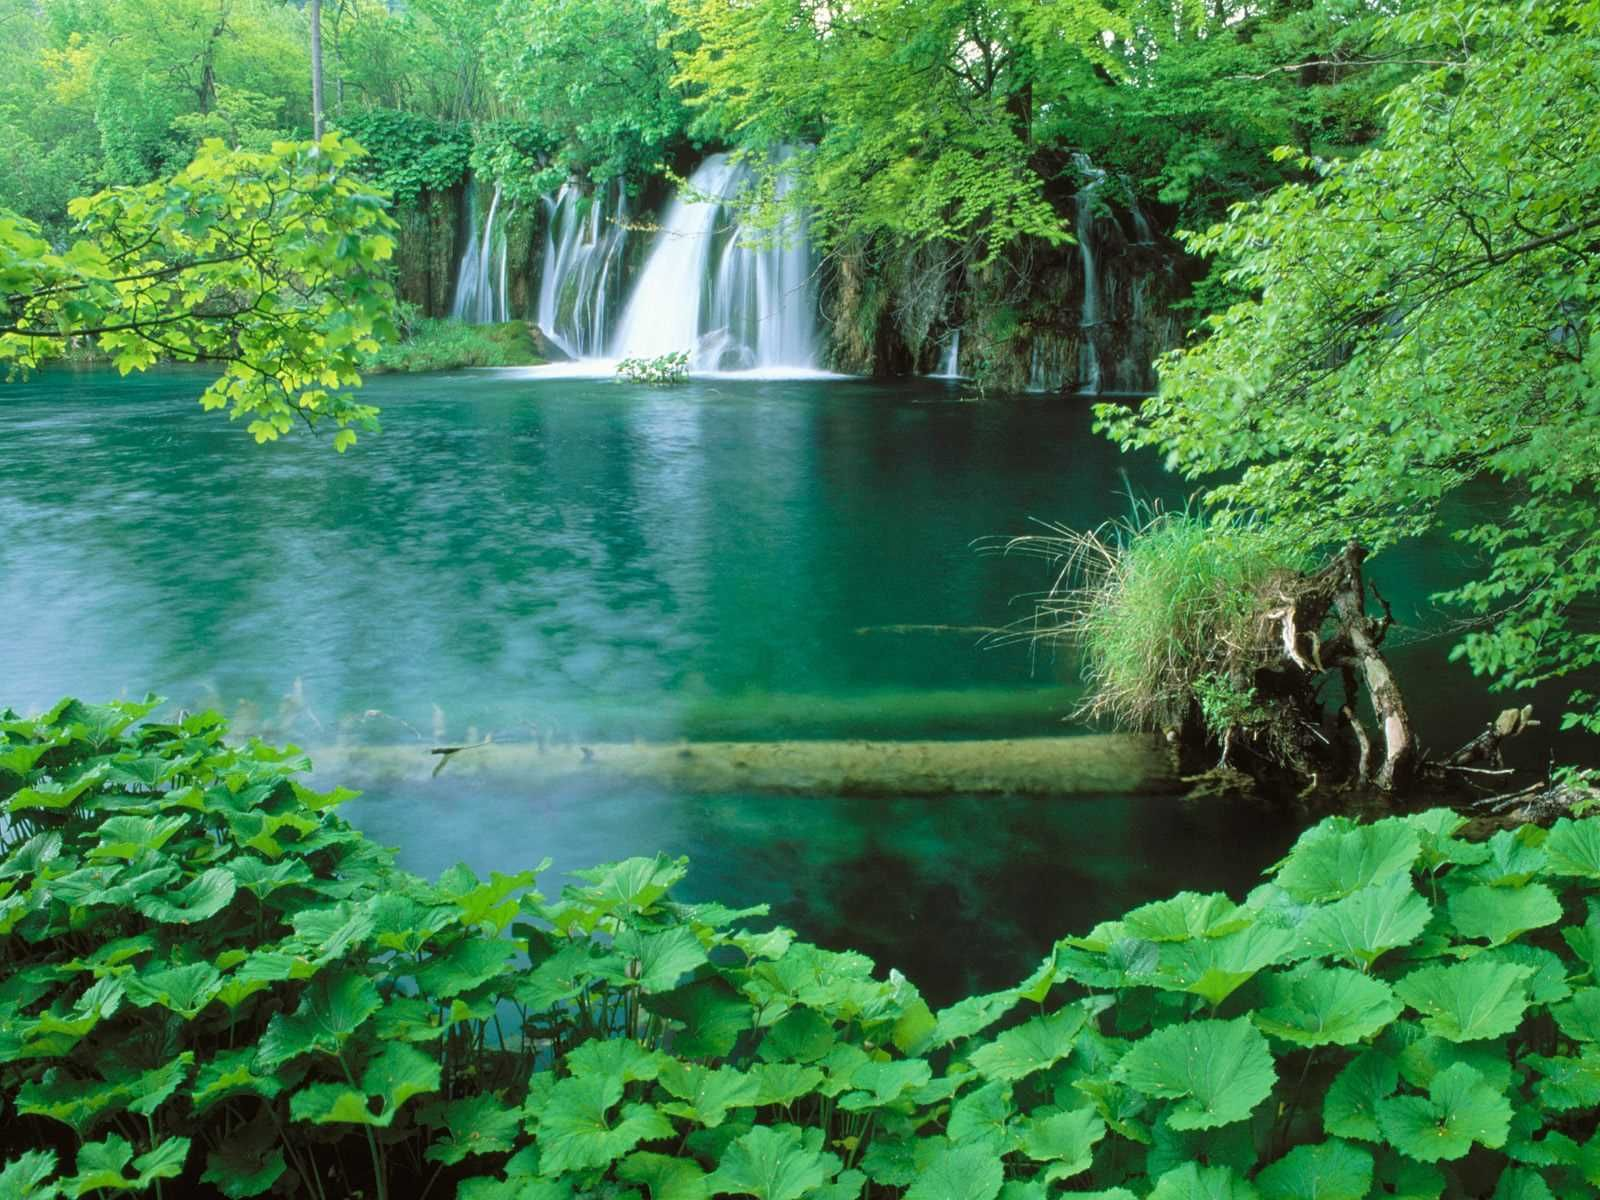 Nature Wallpaper Best Desktop Full Hd Natural Scene For High Resolution Beautiful Nature Scenes Plitvice Lakes National Park Plitvice Lakes